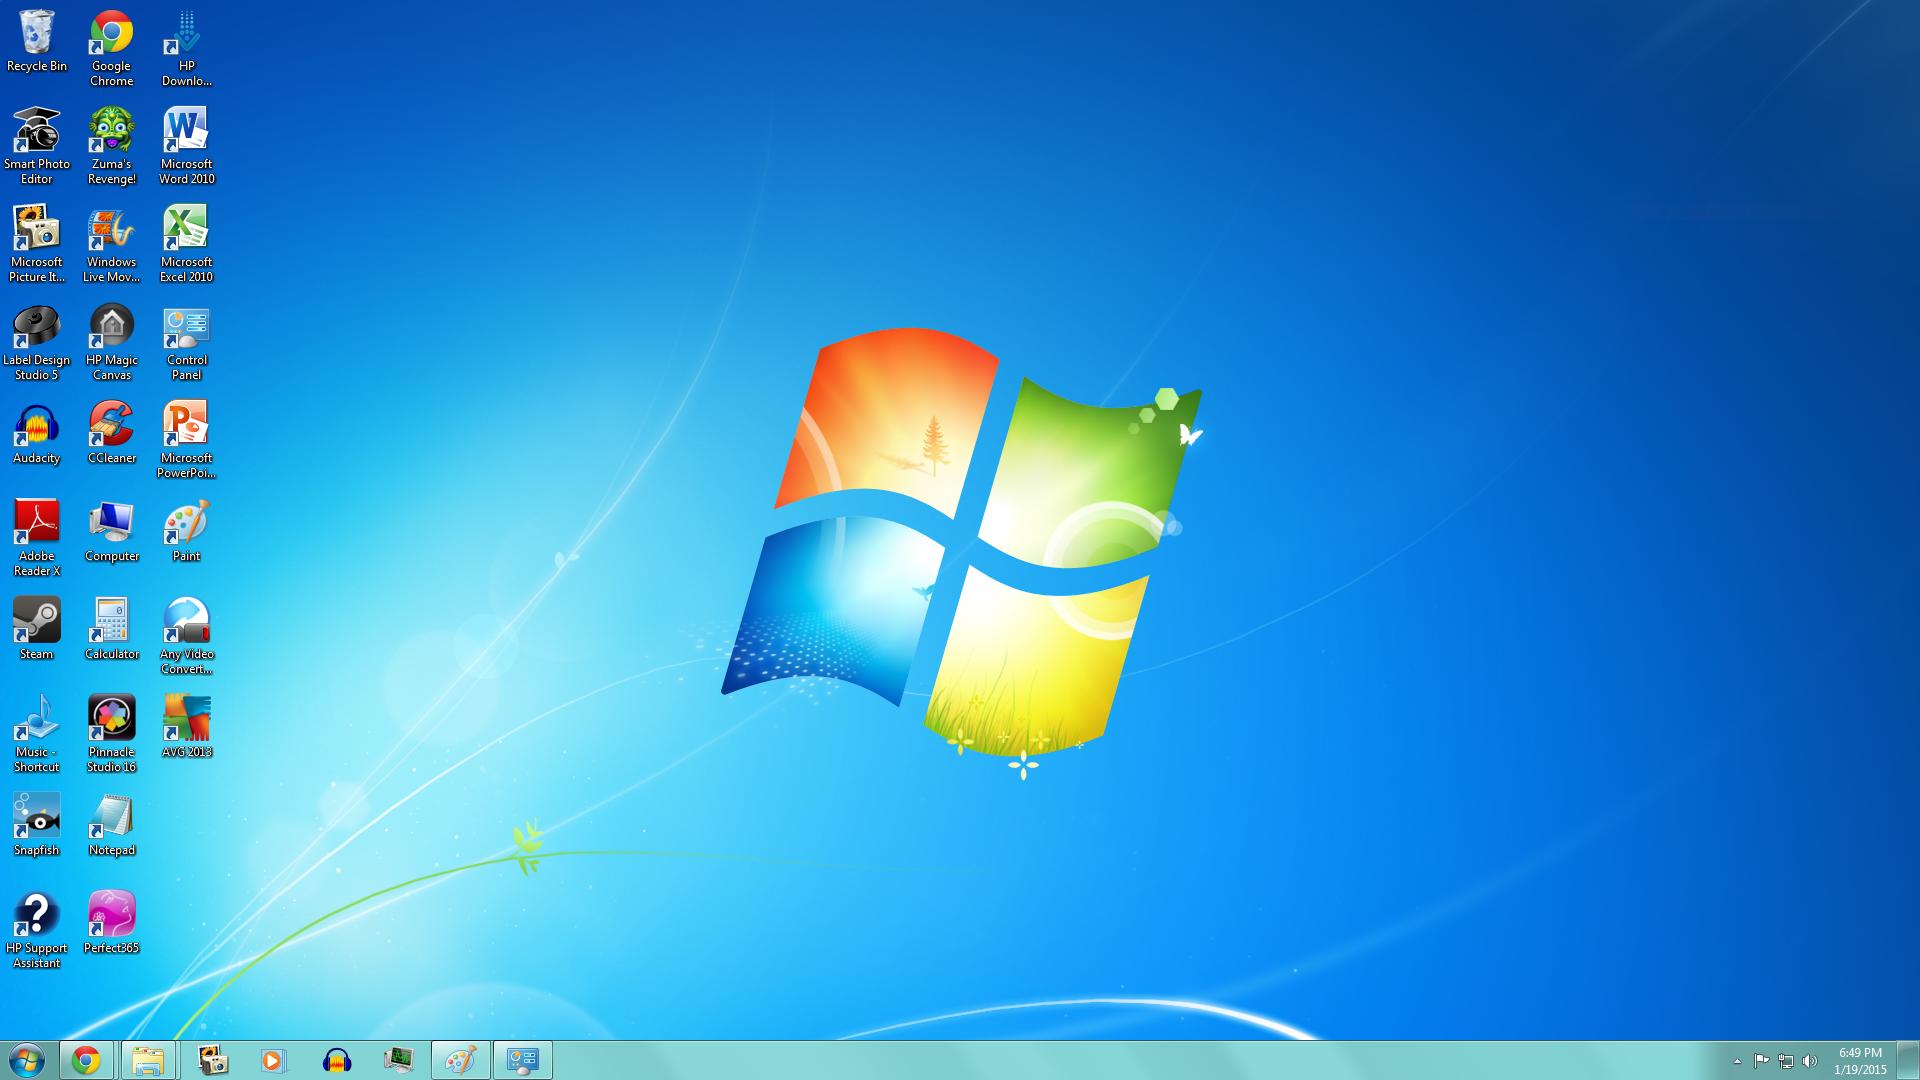 Nintendofan12 images Windows 7 Aero Opaque No Window V2 3 HD wallpaper and background photos